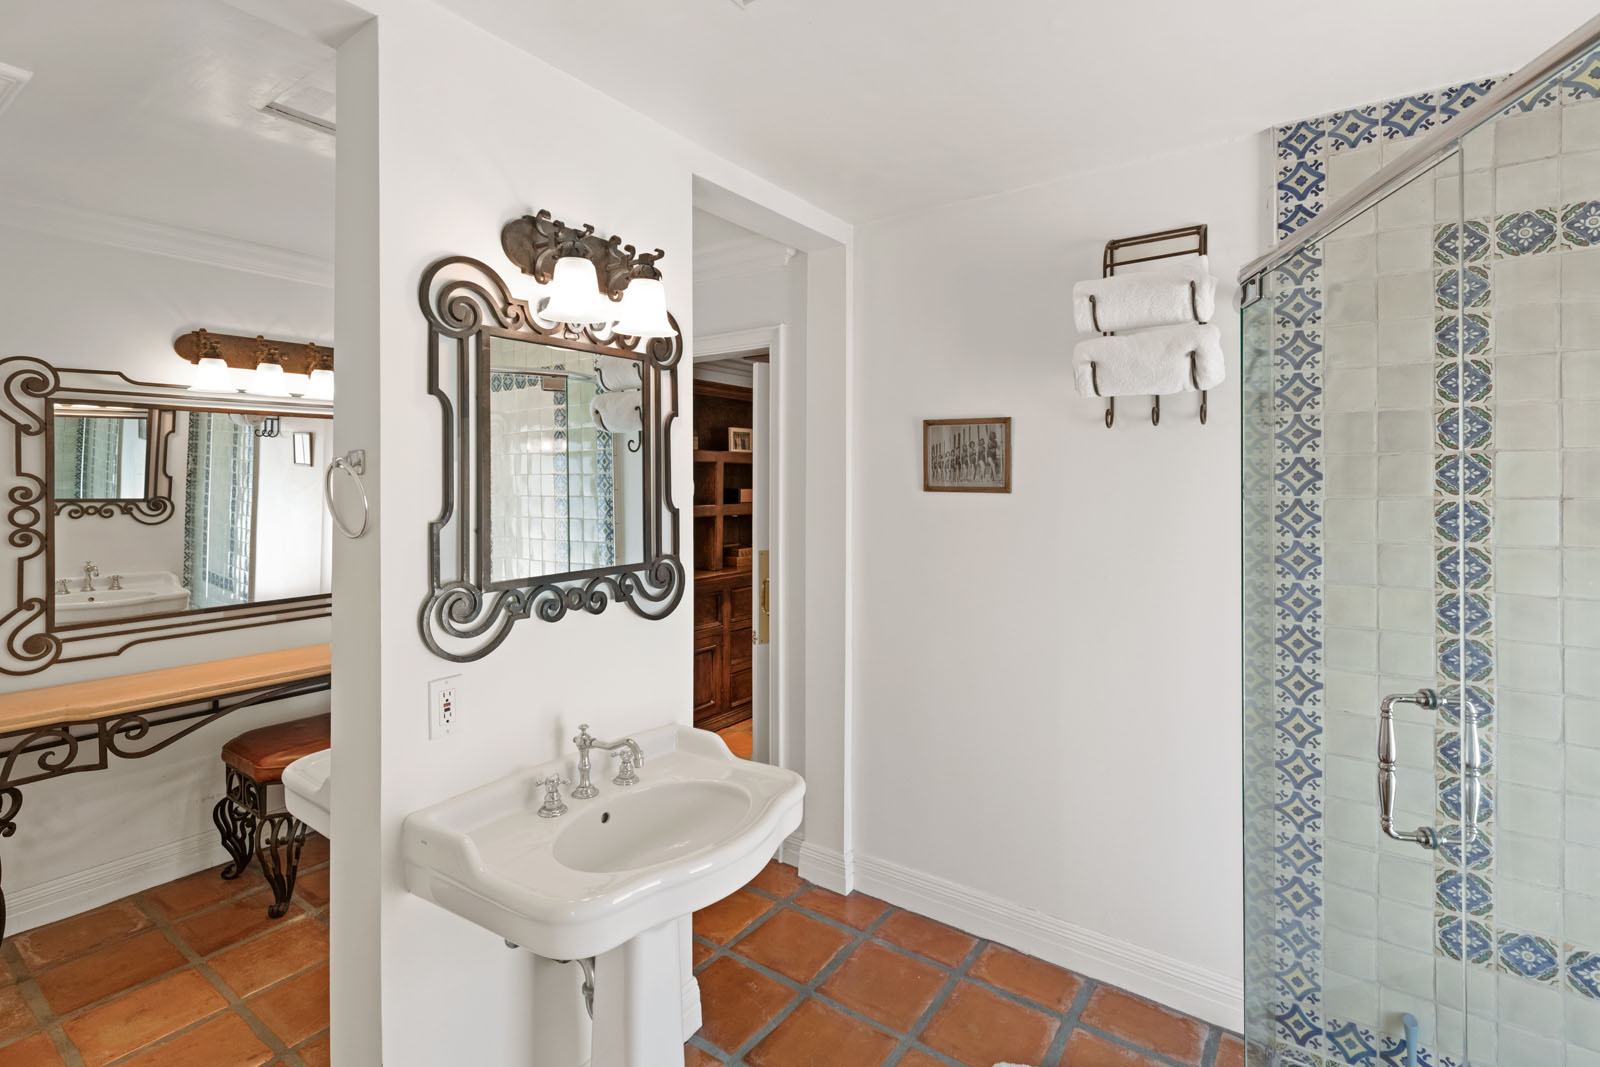 020 Master Bathroom 1712 Manzanita Park Avenue Malibu For Sale Lease The Malibu Life Team Luxury Real Estate.jpg